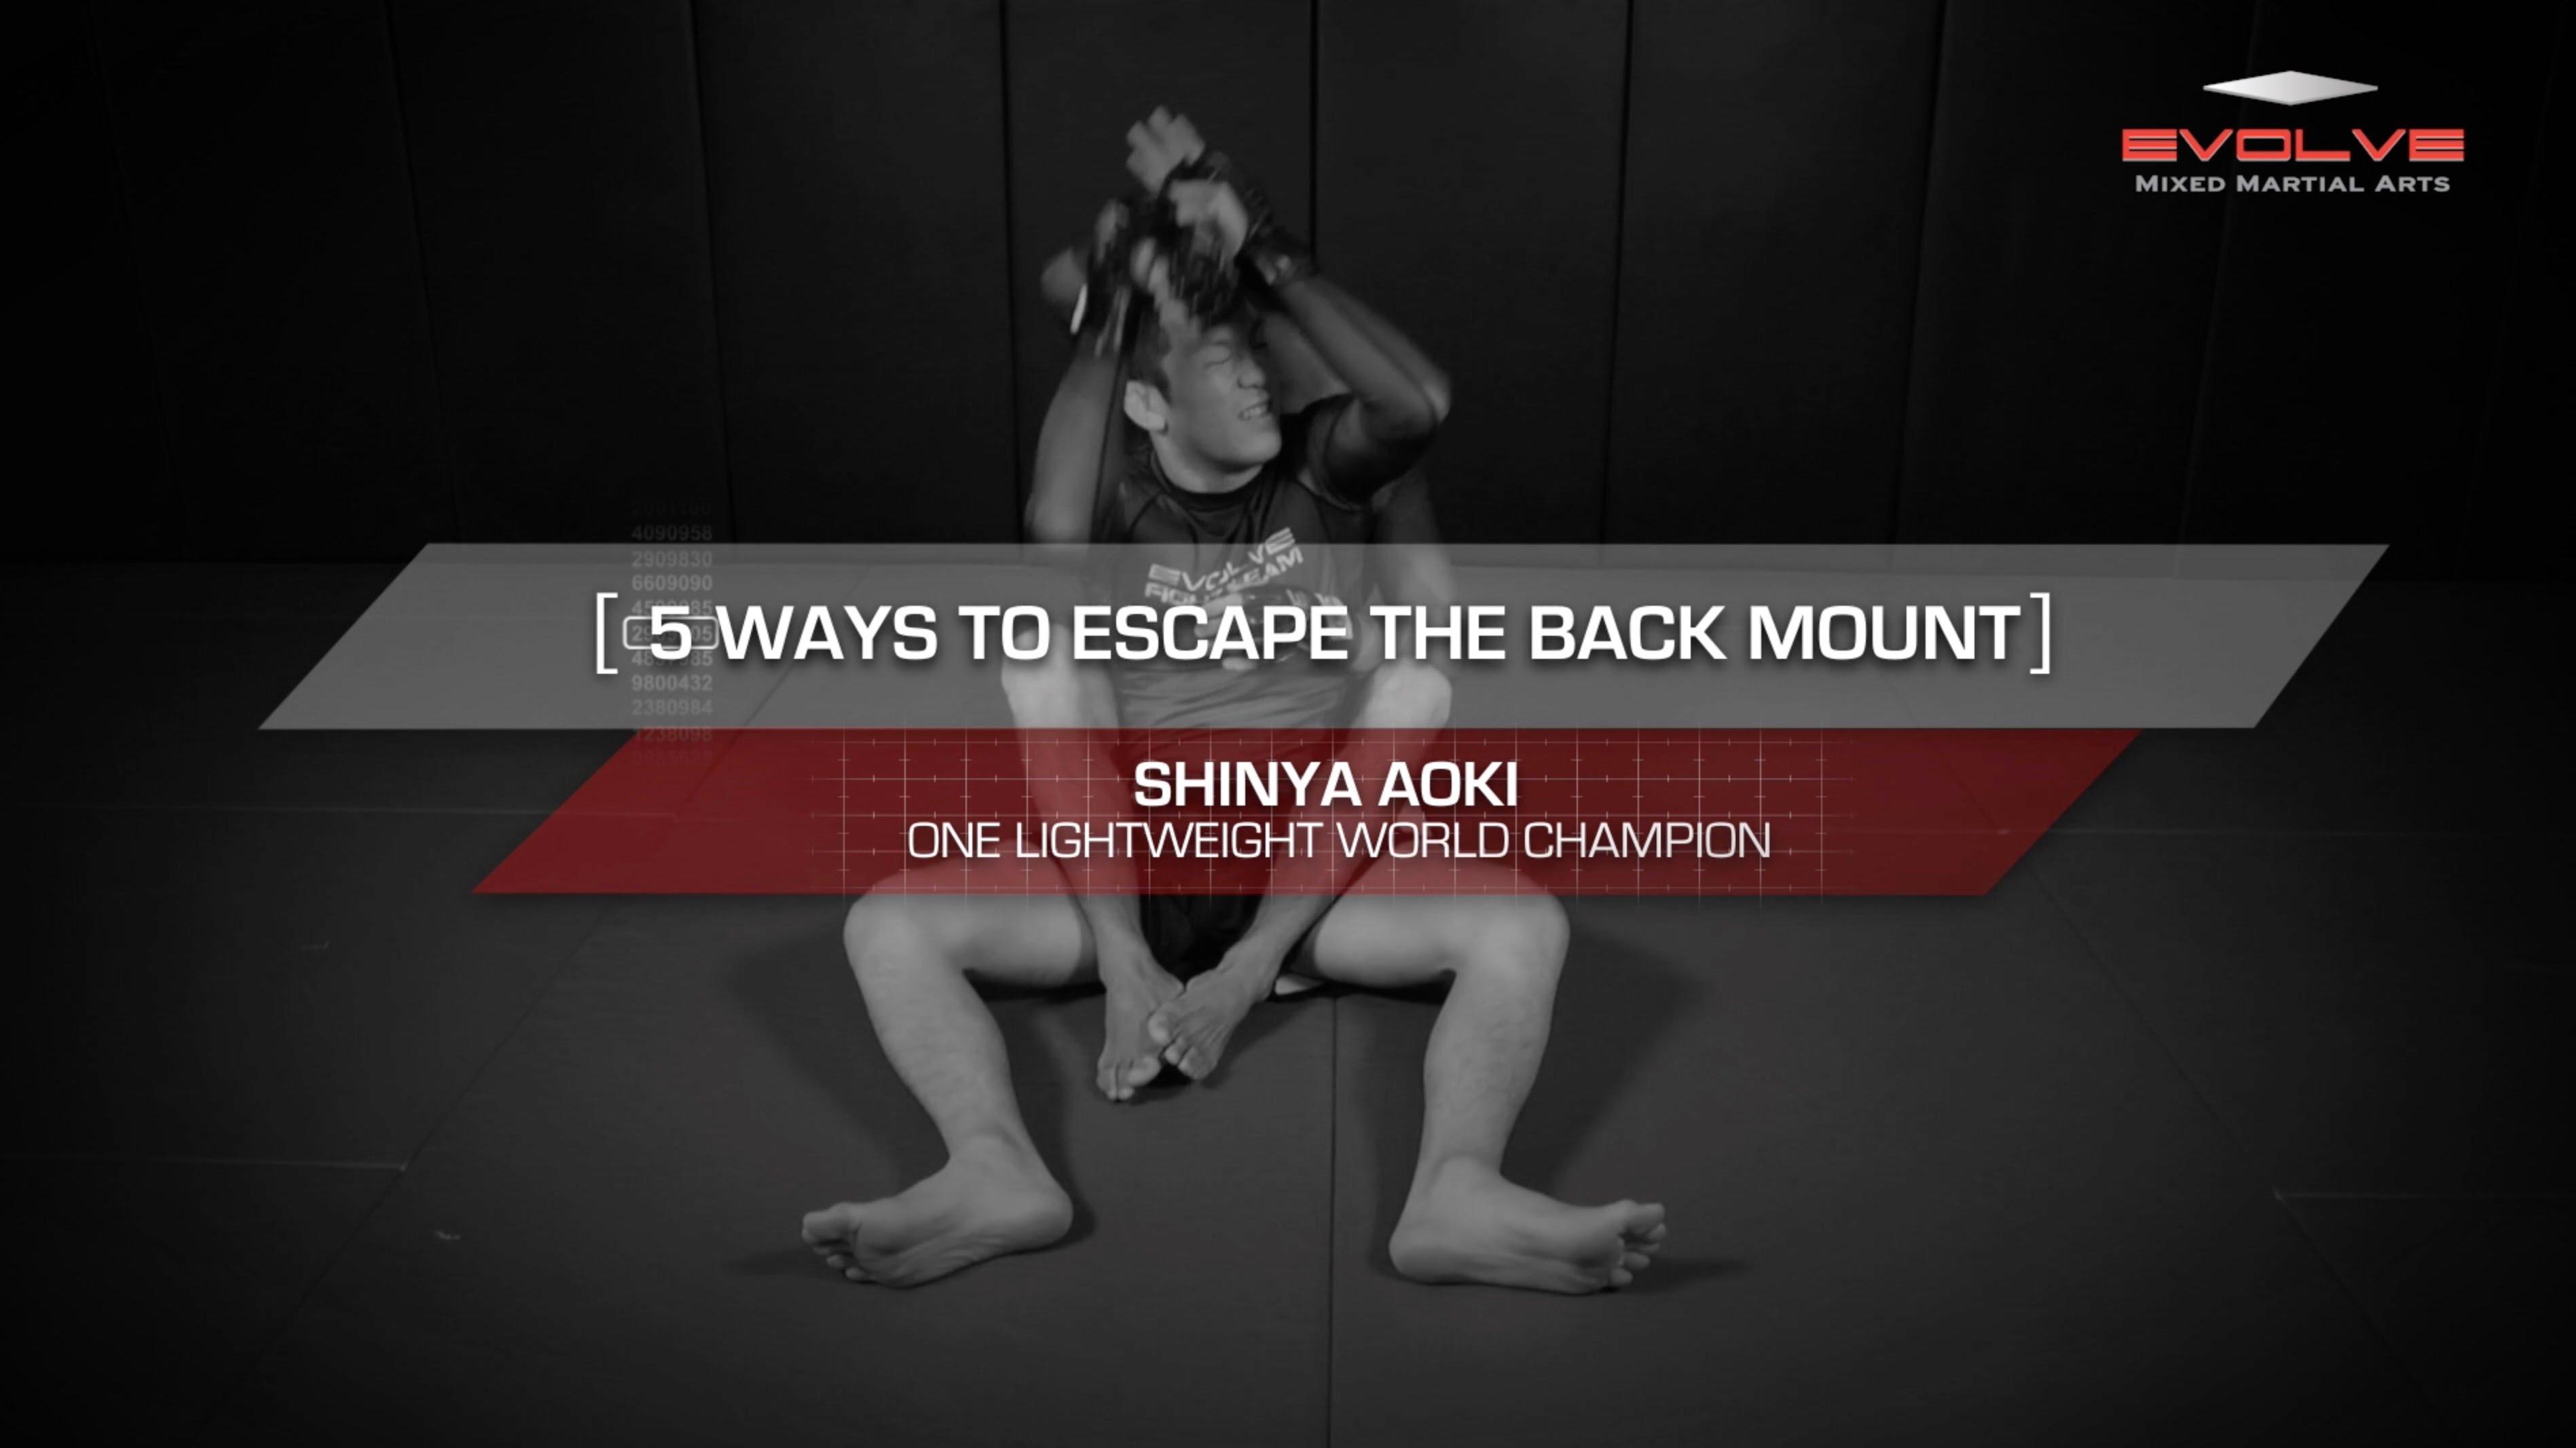 Shinya Aoki's 5 Ways To Escape The Back Mount | Evolve University